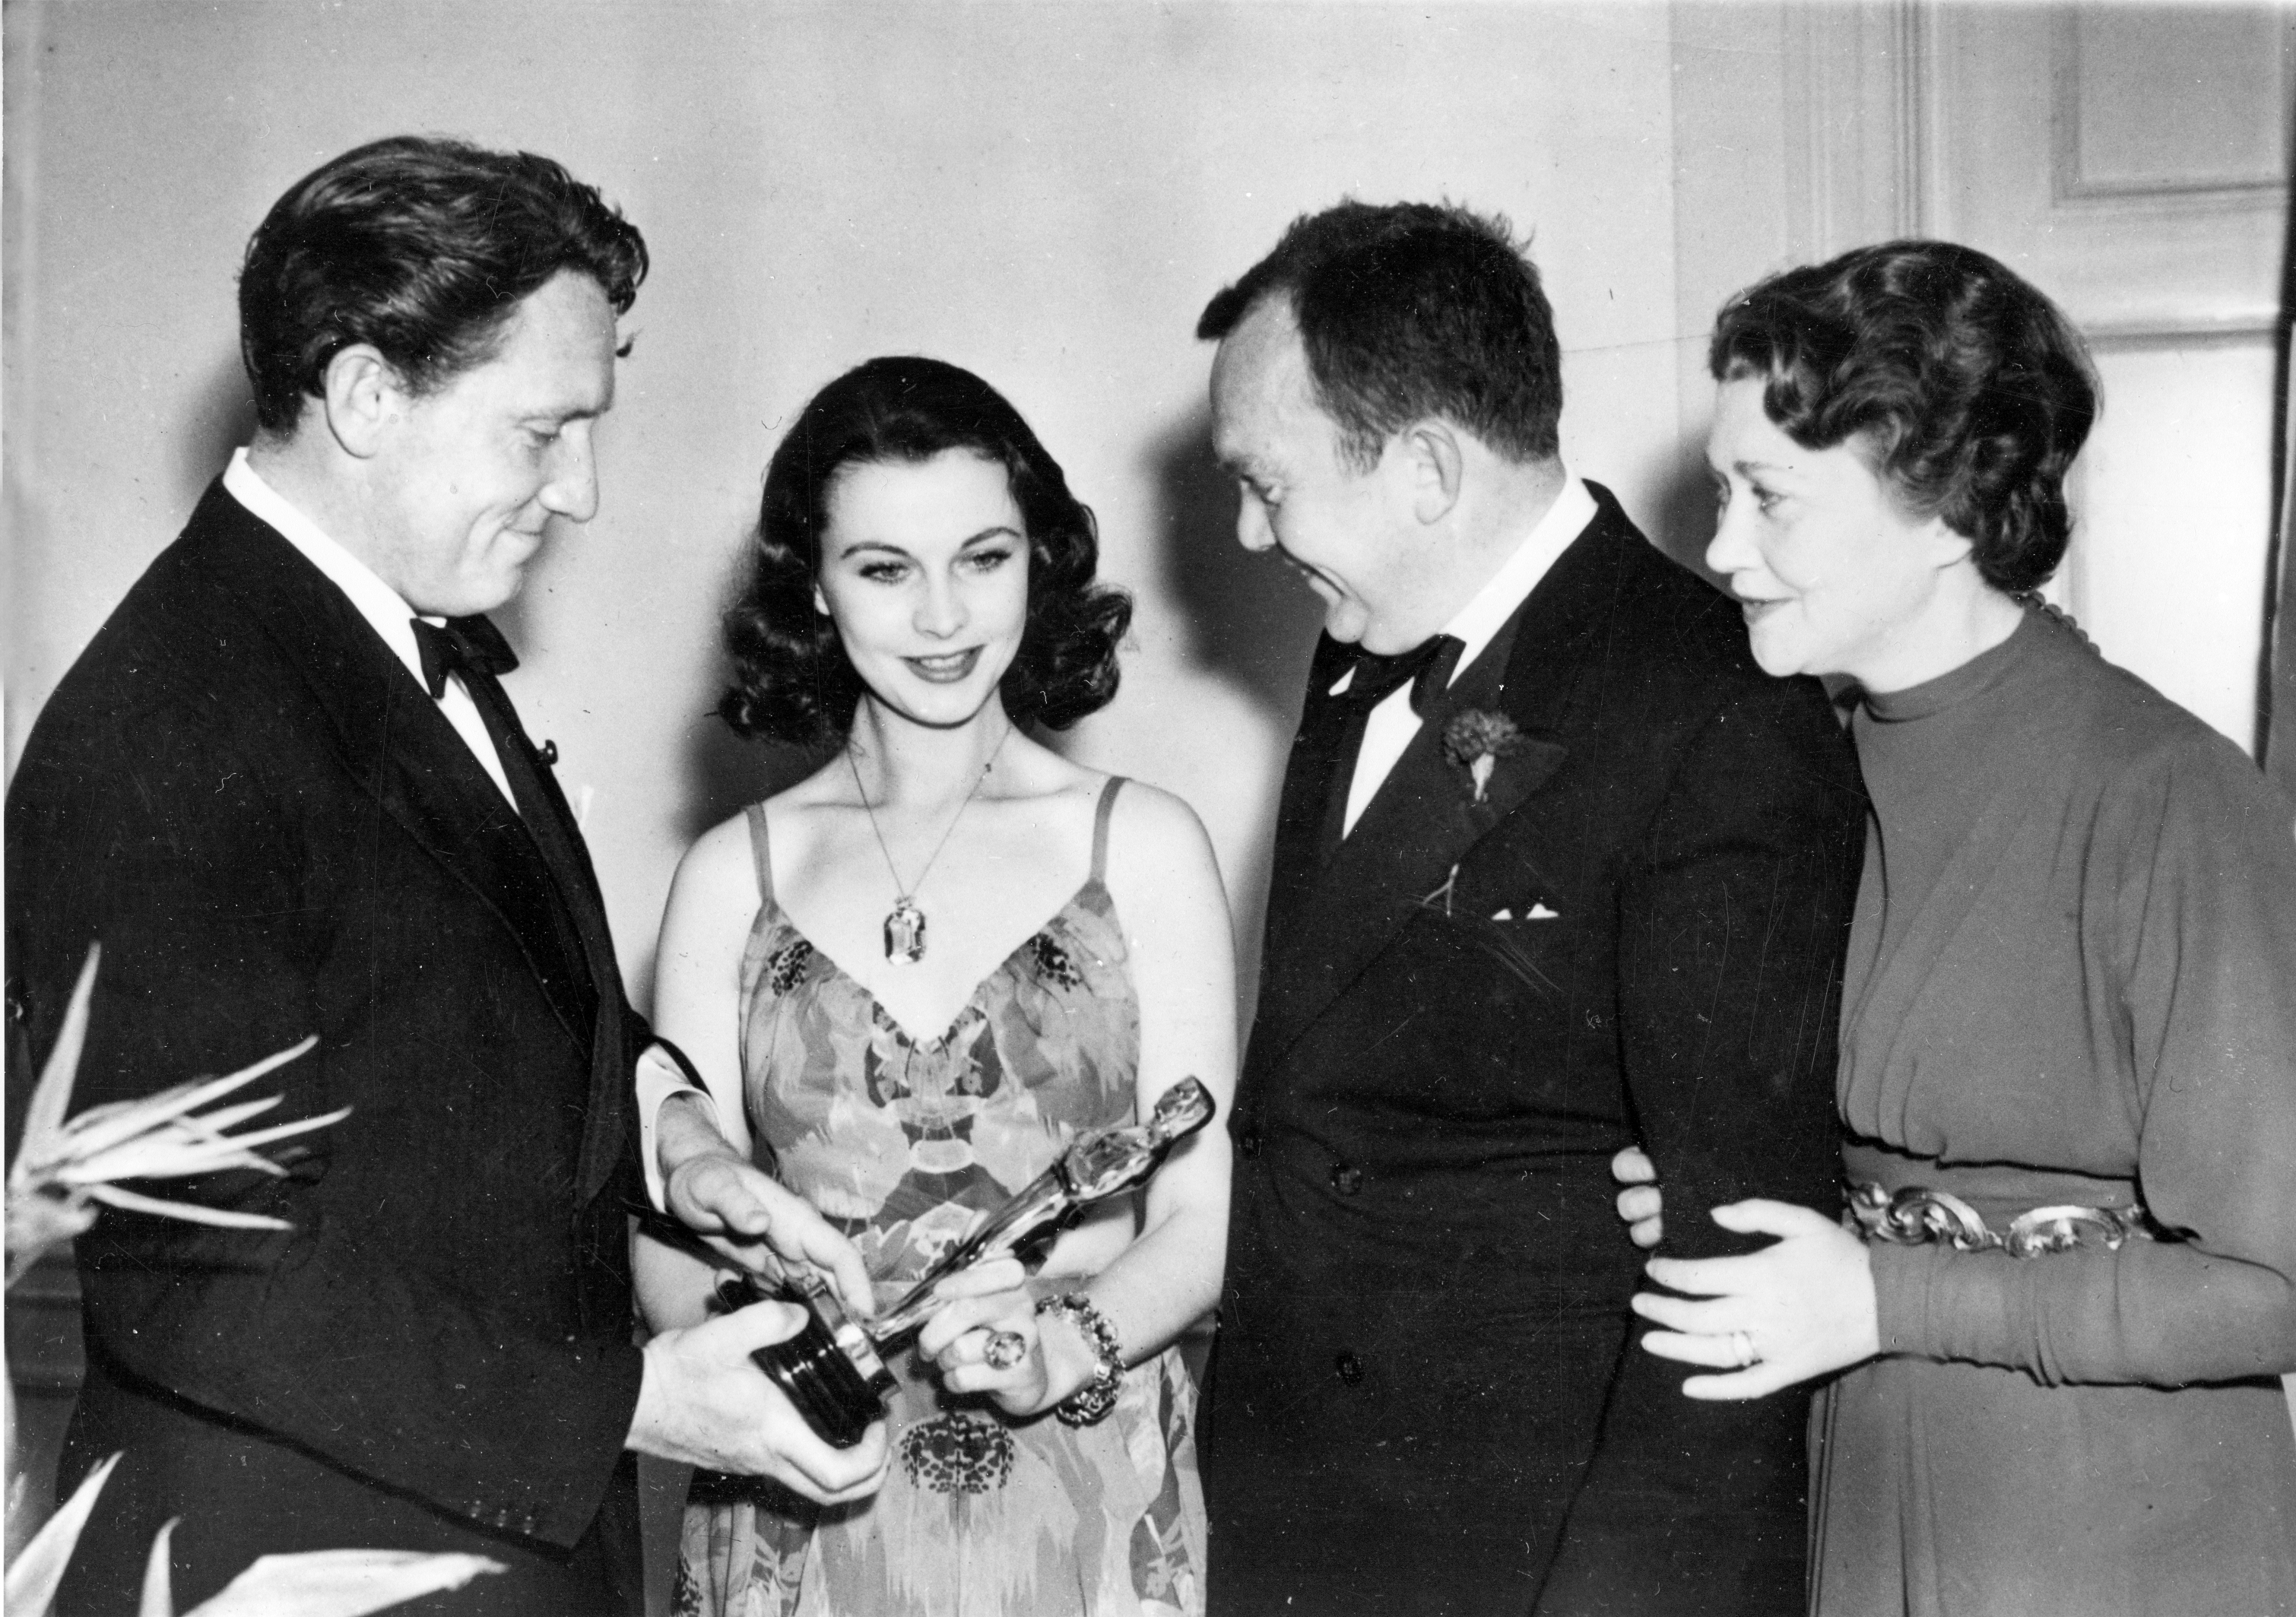 <br /> 1949年2月29日《亂世佳人》抱得奧斯卡多項大獎,包括女主角費雯·麗拿下最佳女主角獎(左2)。